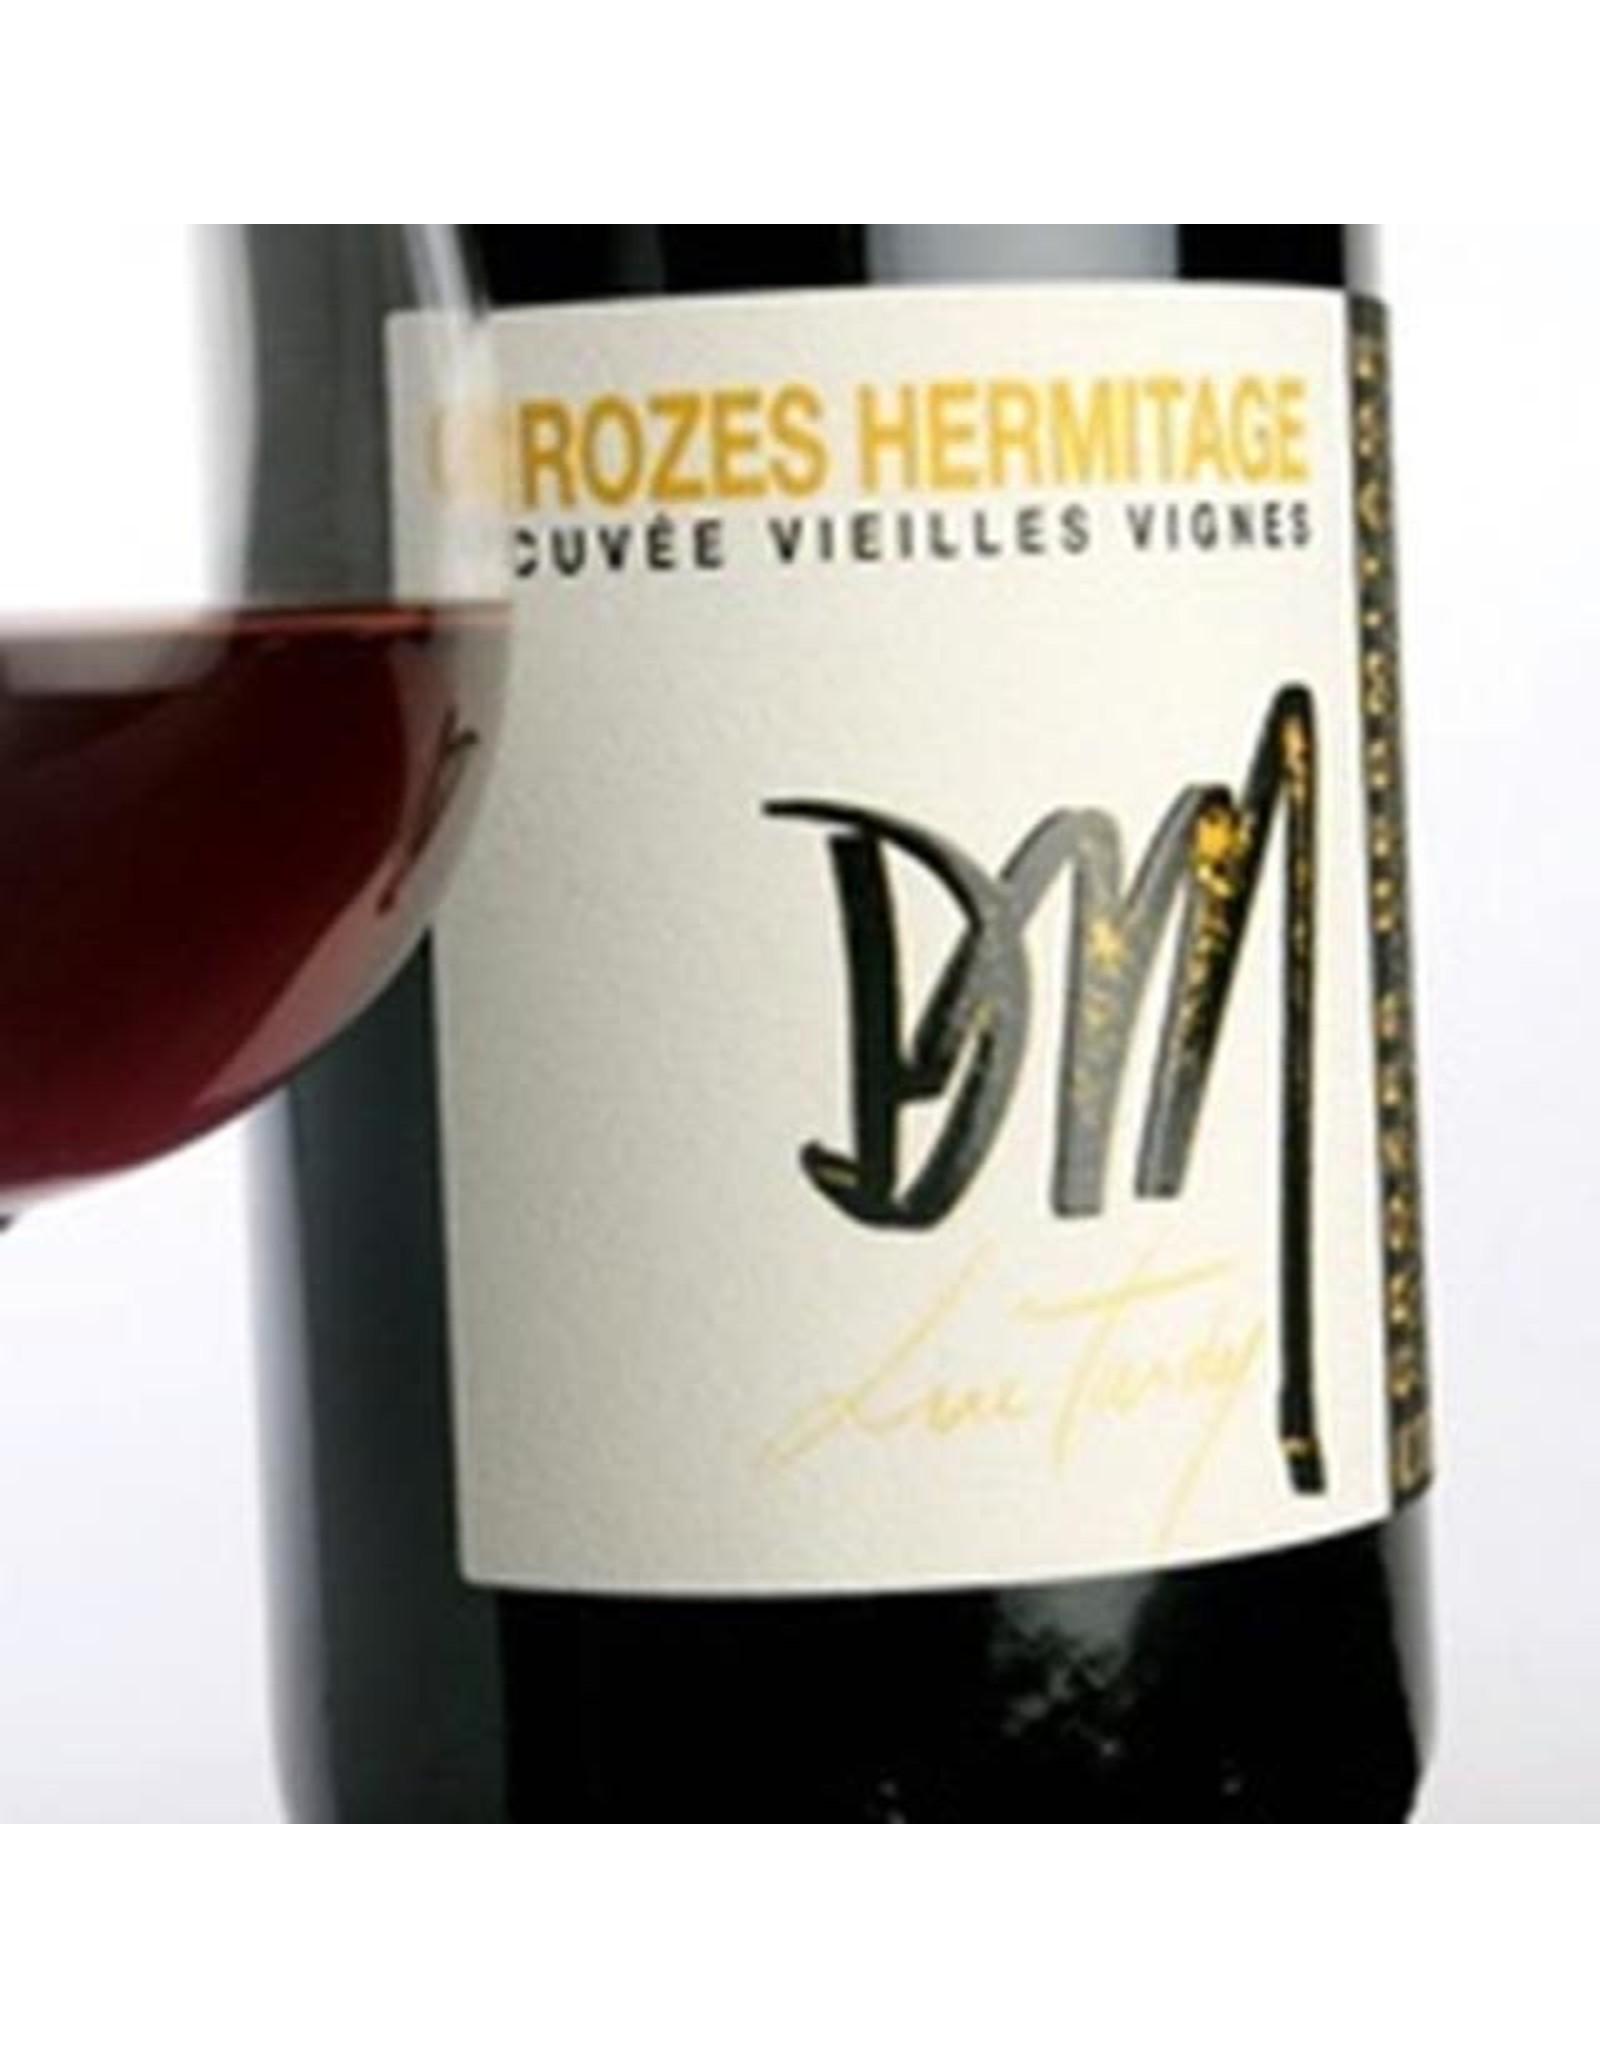 DOMAINE DU MURINAIS CROZES HERMITAGE 2008